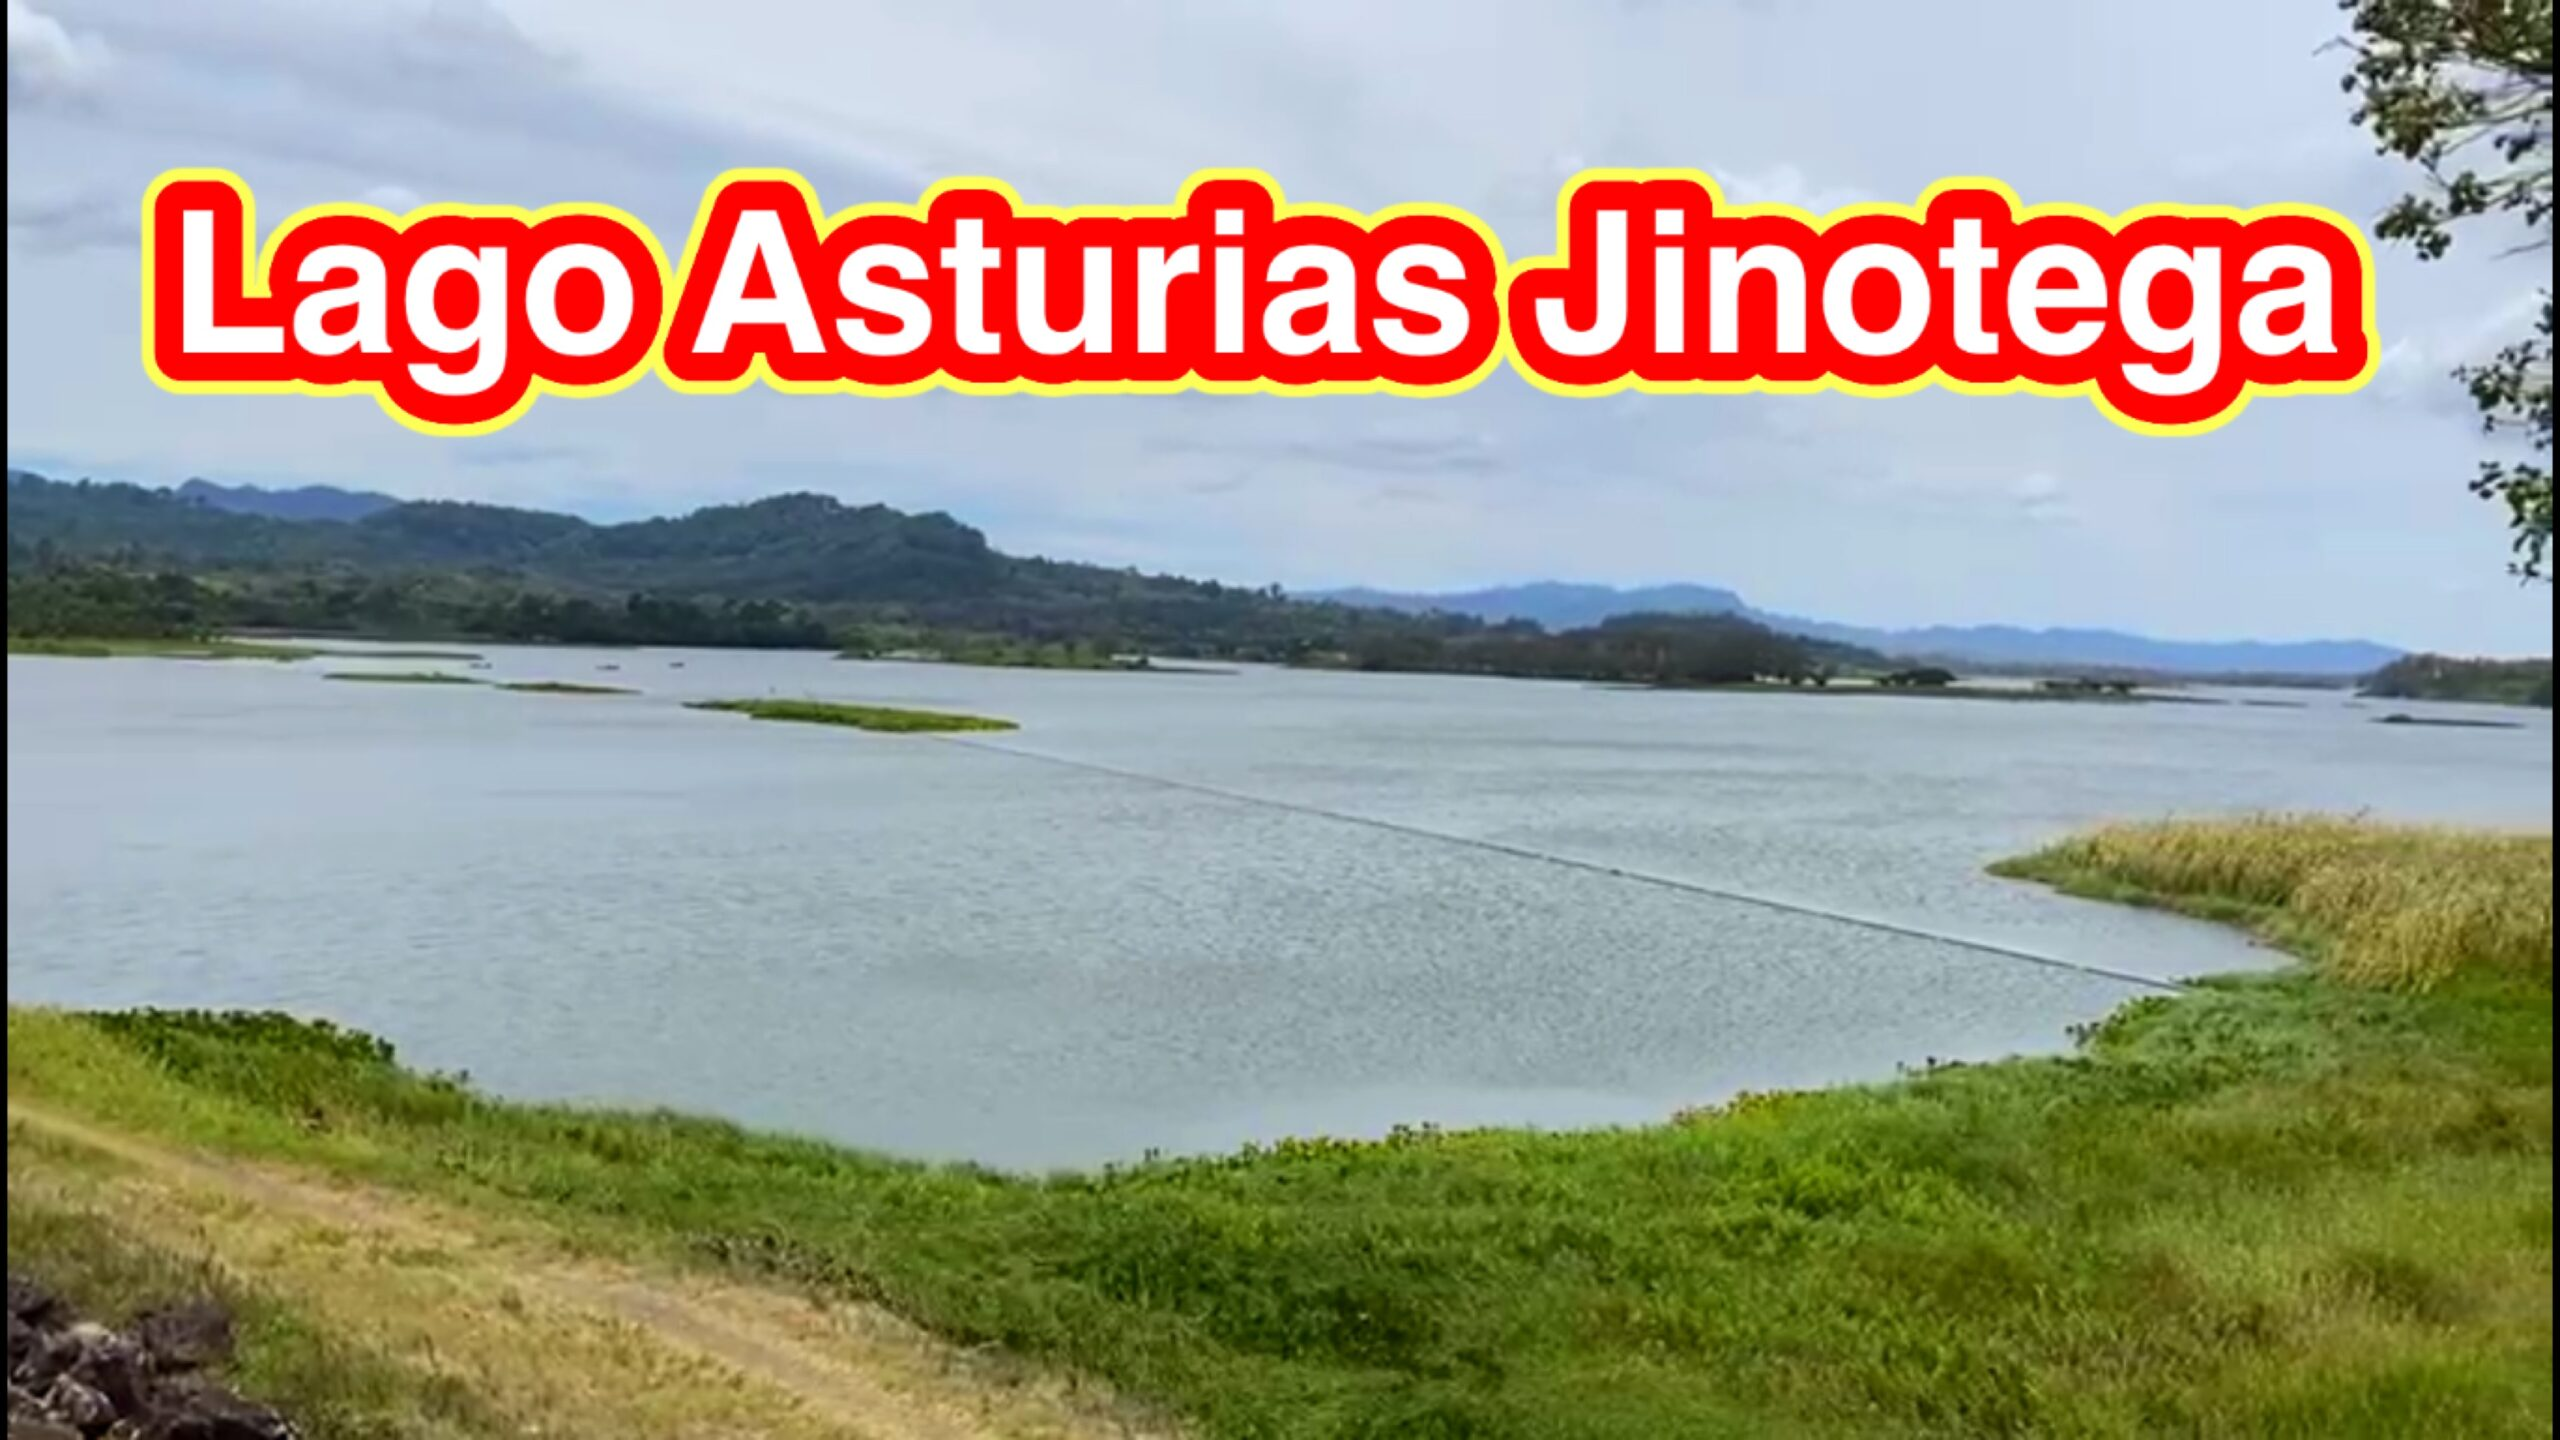 Lago de Asturias en Jinotega Nicaragua